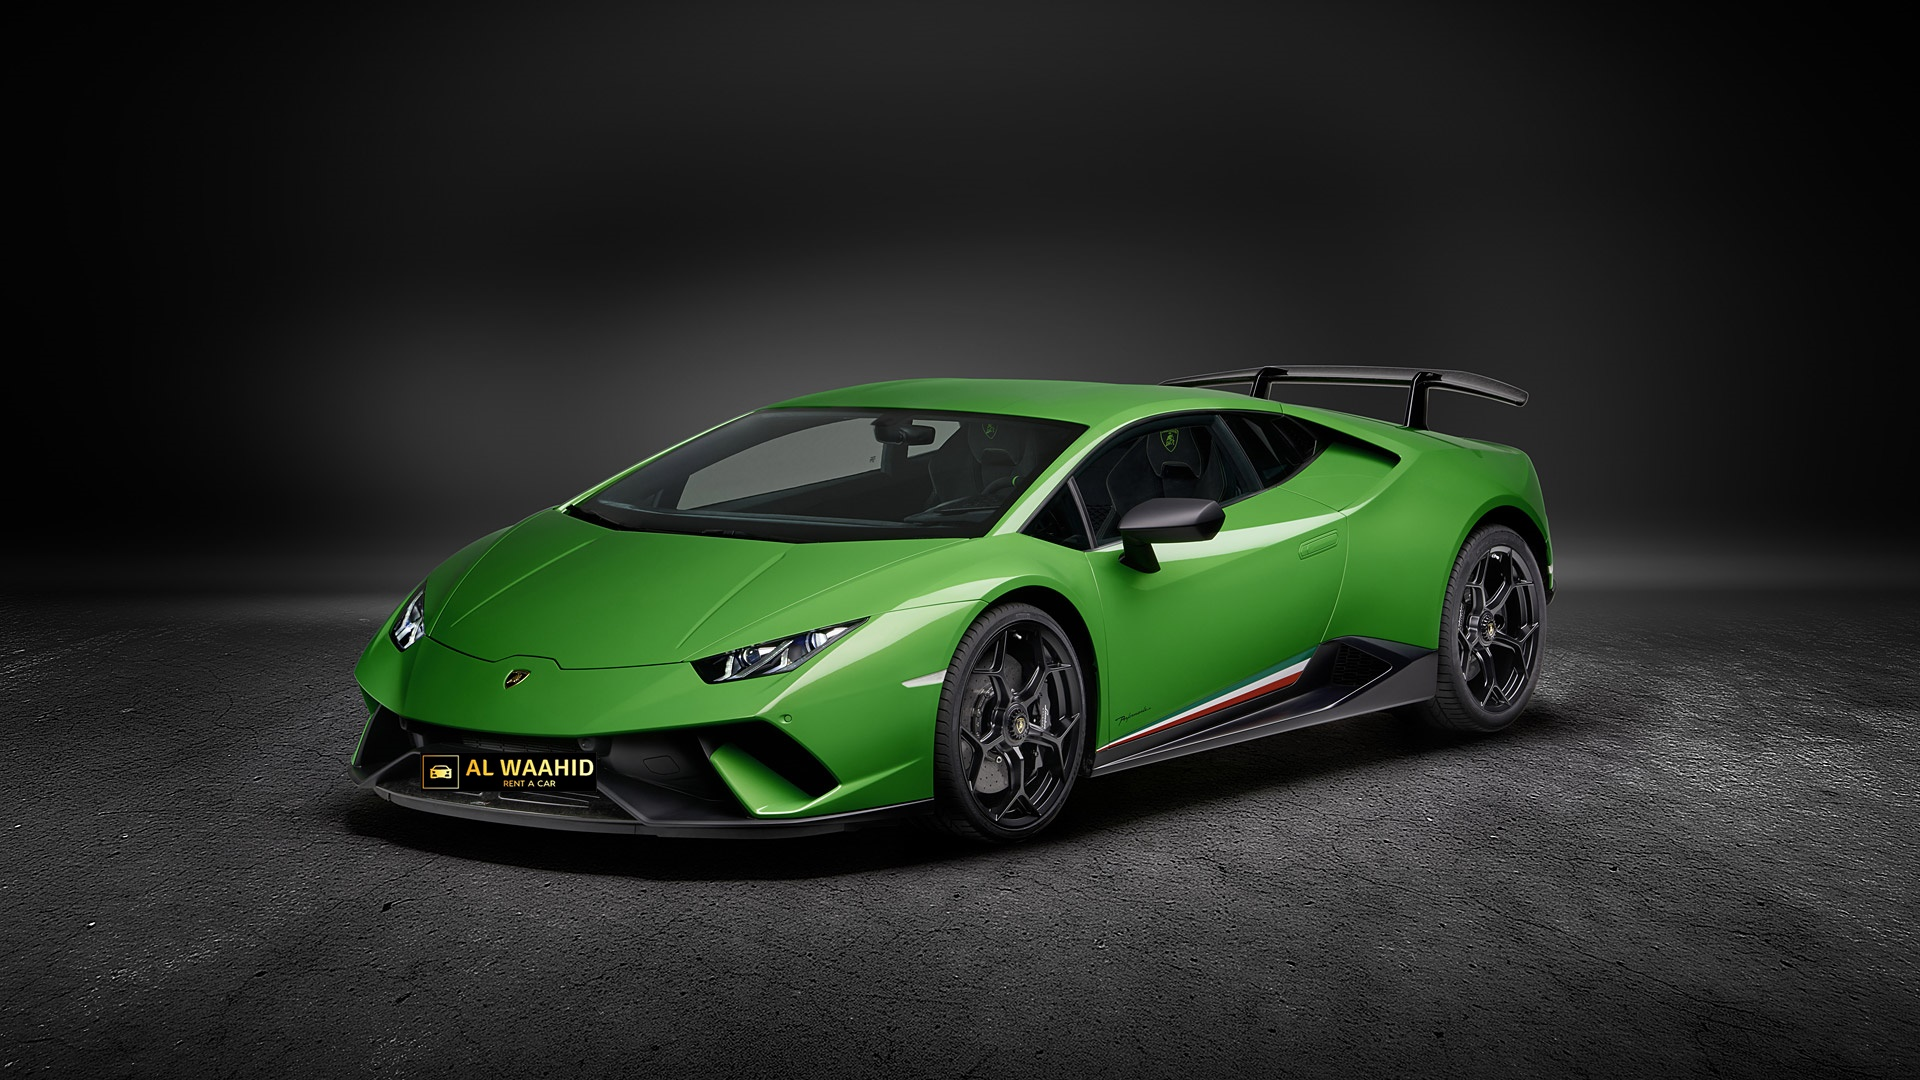 Lamborghini Huracan Performante 2018 rental dubai luxury cars alwaheed rental